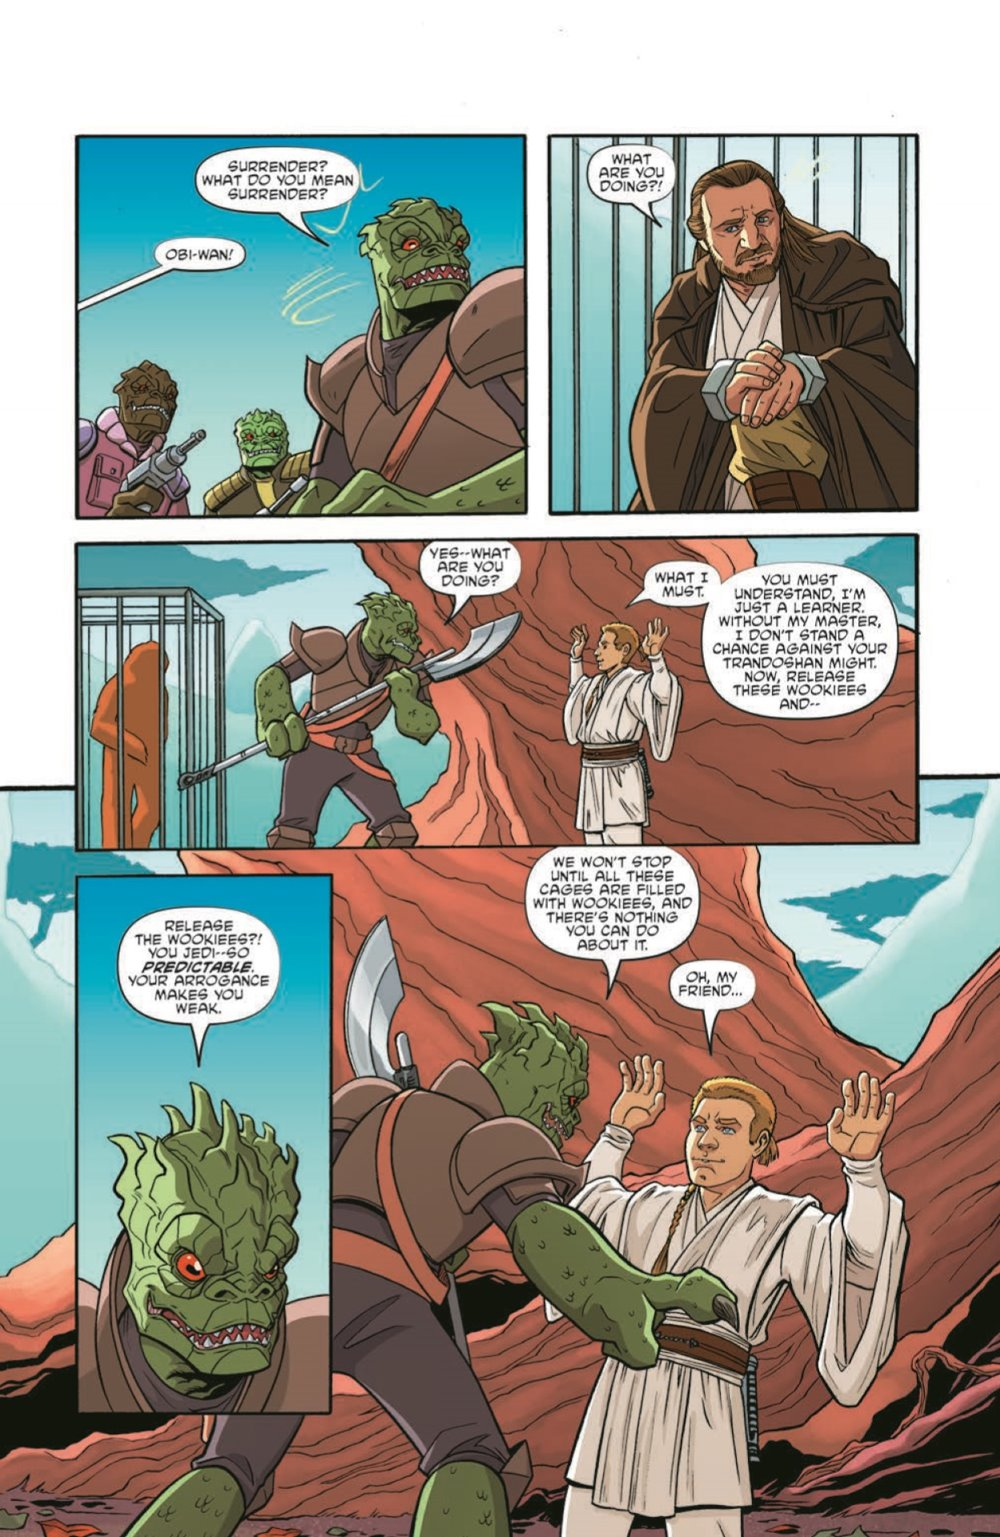 StarWarsAdv04-pr-7 ComicList Previews: STAR WARS ADVENTURES VOLUME 2 #4